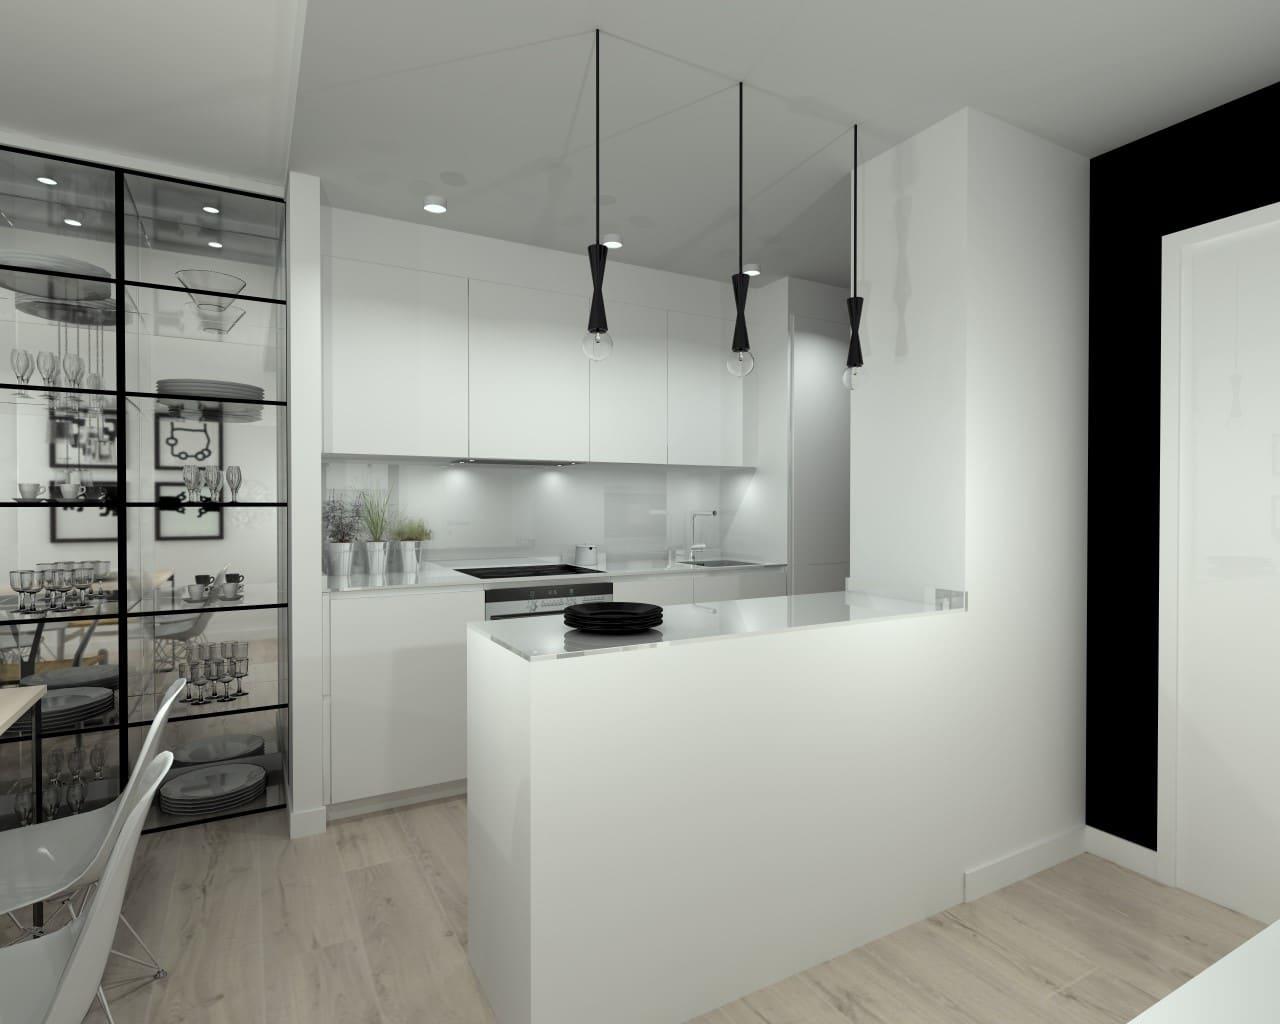 Cocina abierta en apartamento peque o estudio cocinas dc for Cocinas modernas para apartamentos pequenos